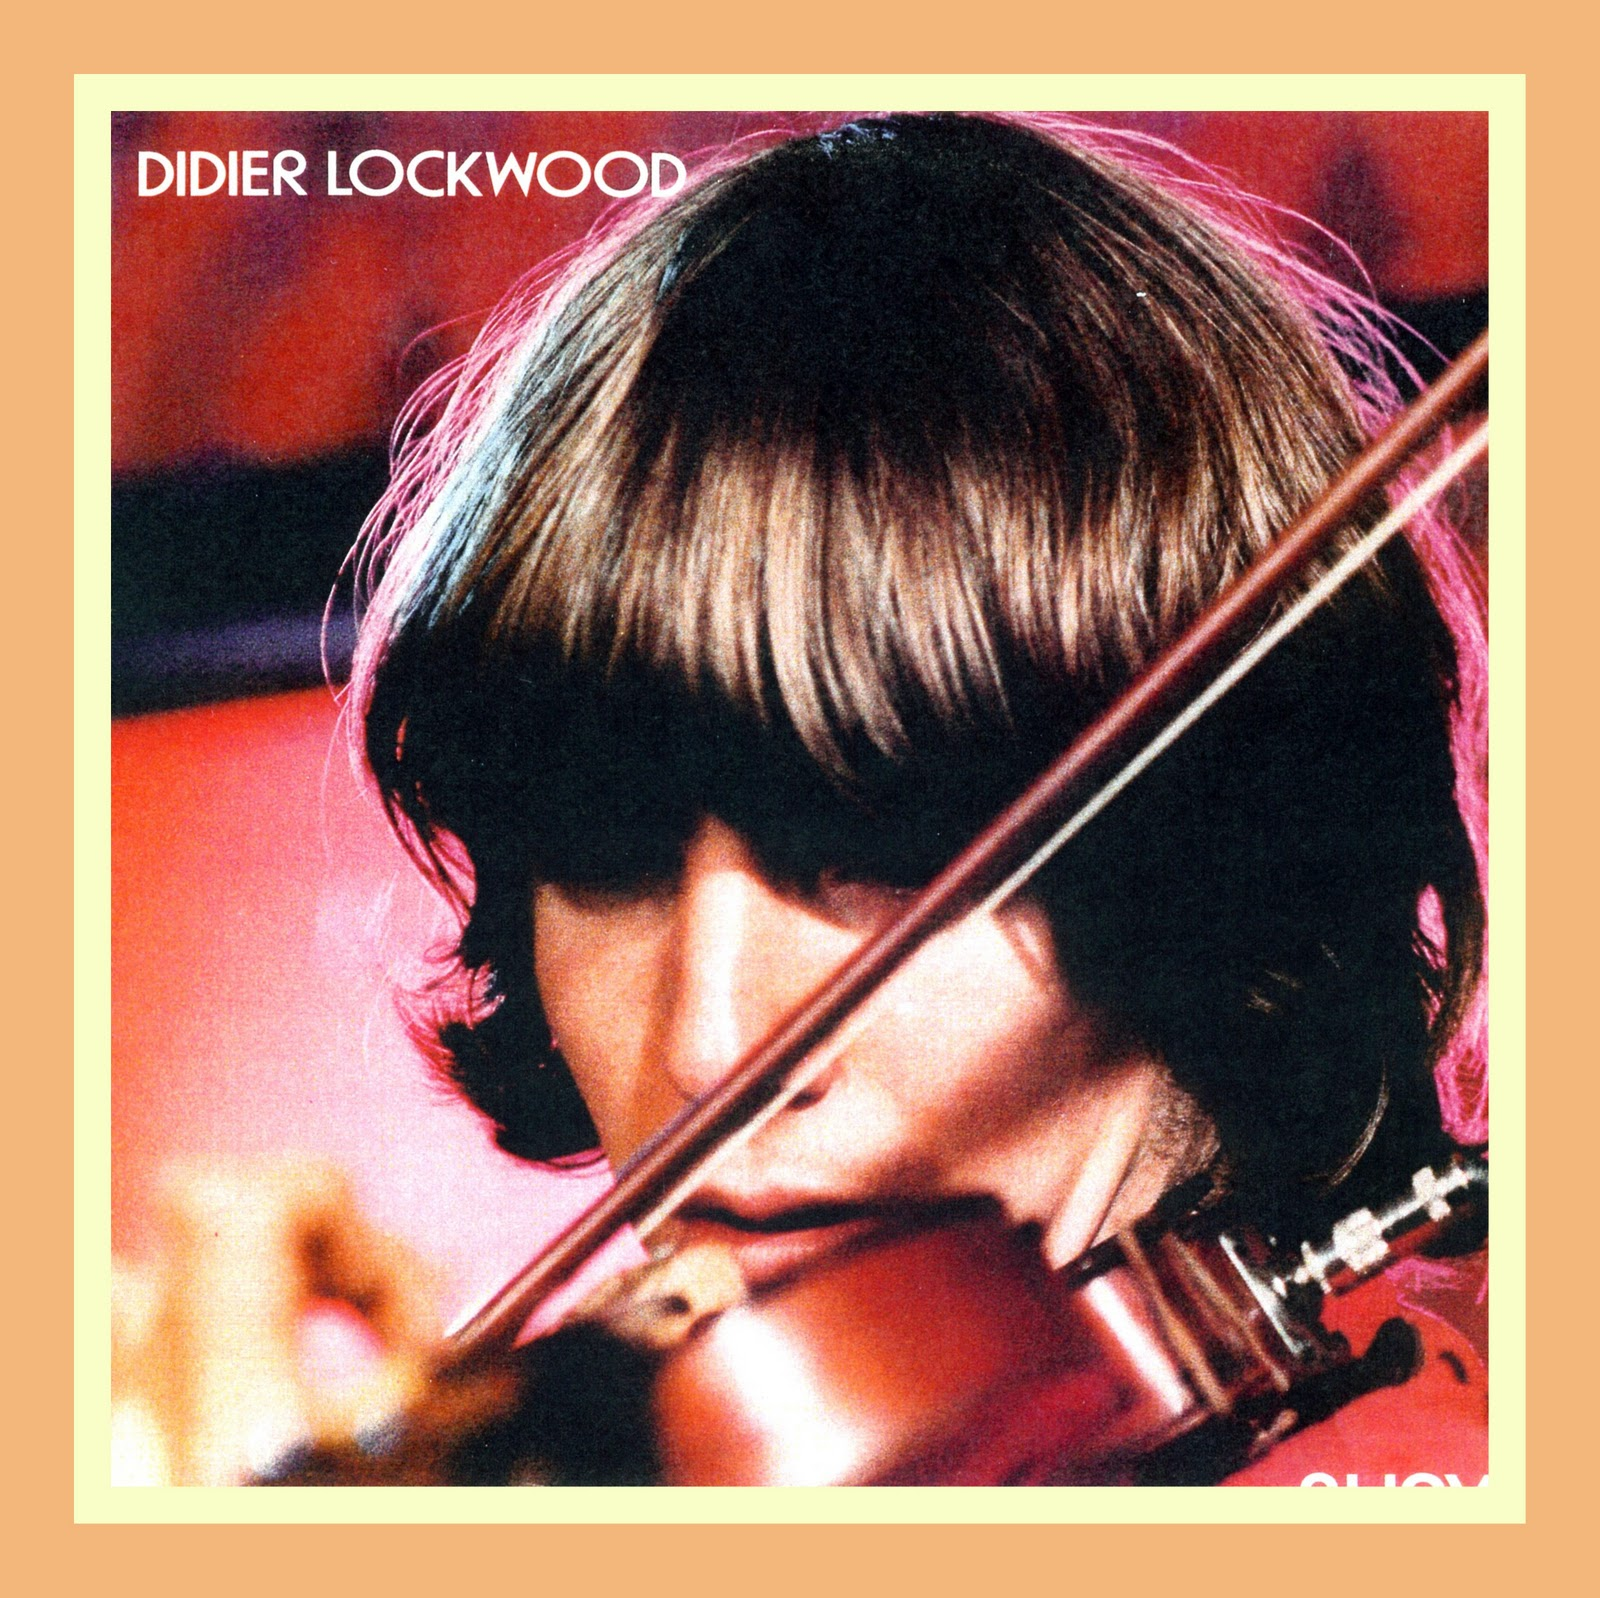 Didier Lockwood - New World